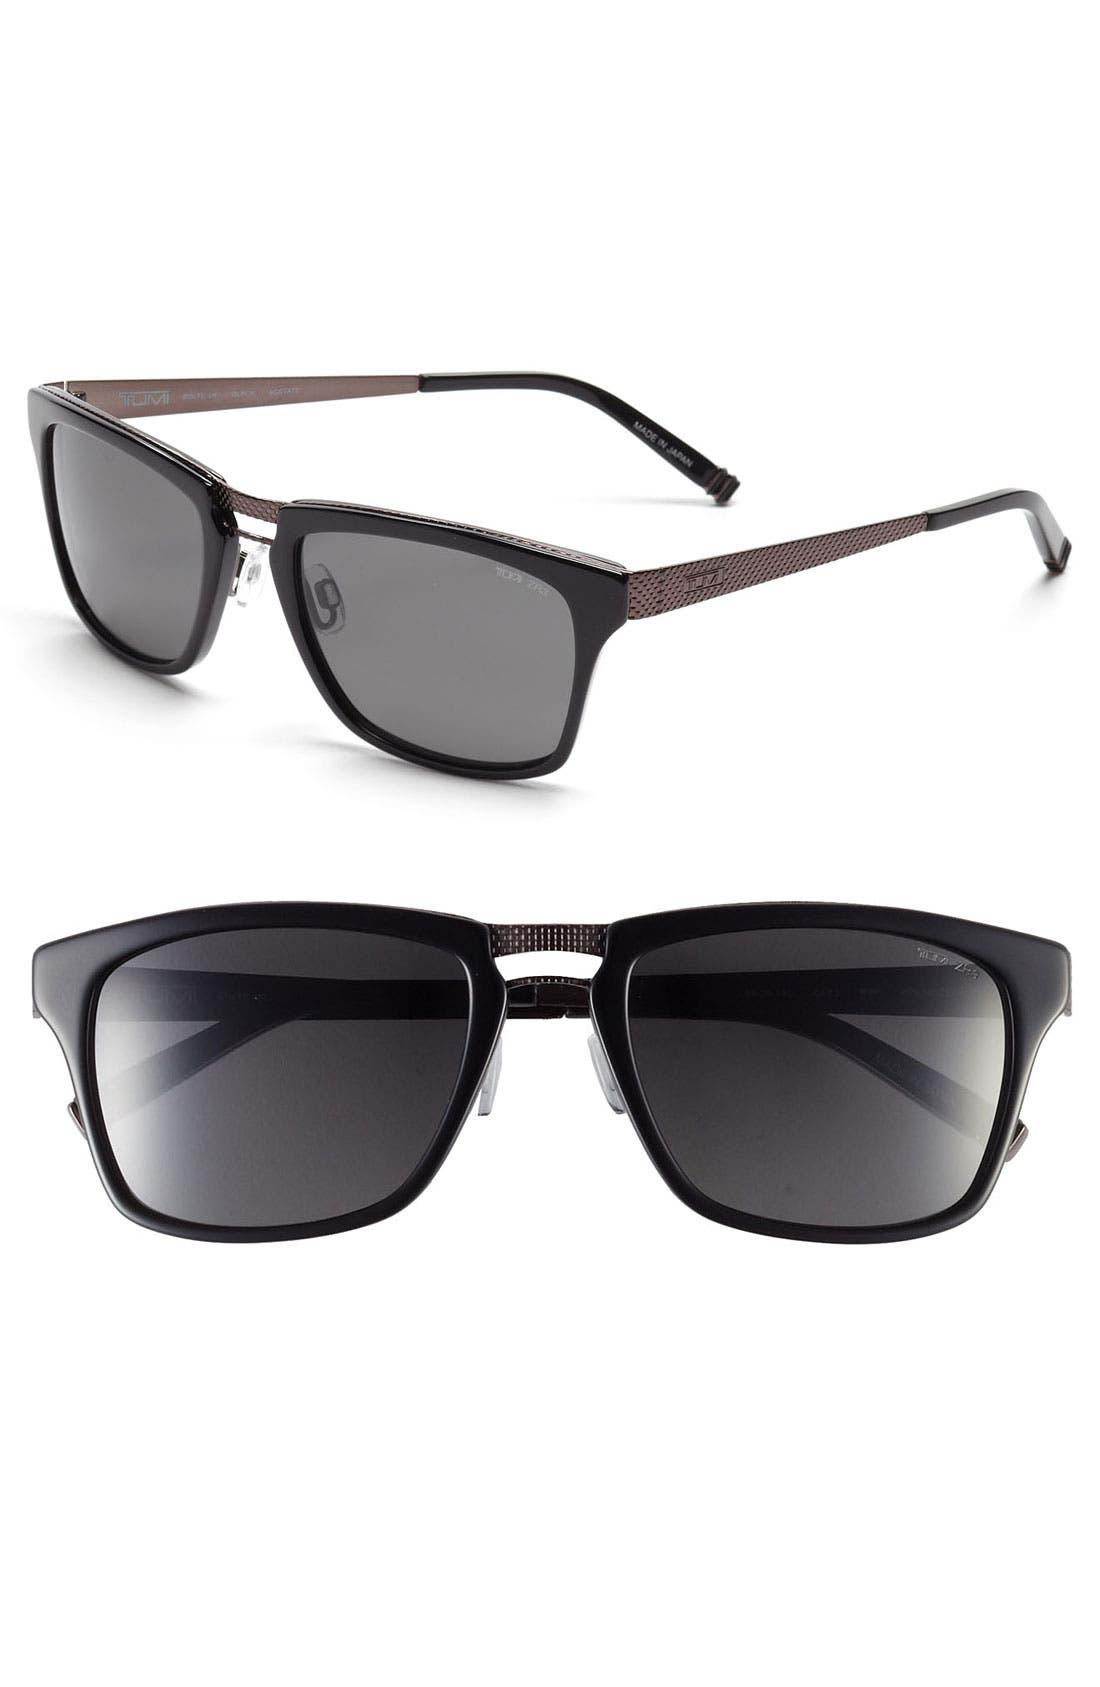 Alternate Image 1 Selected - Tumi 'Bolte' 54mm Polarized Sunglasses